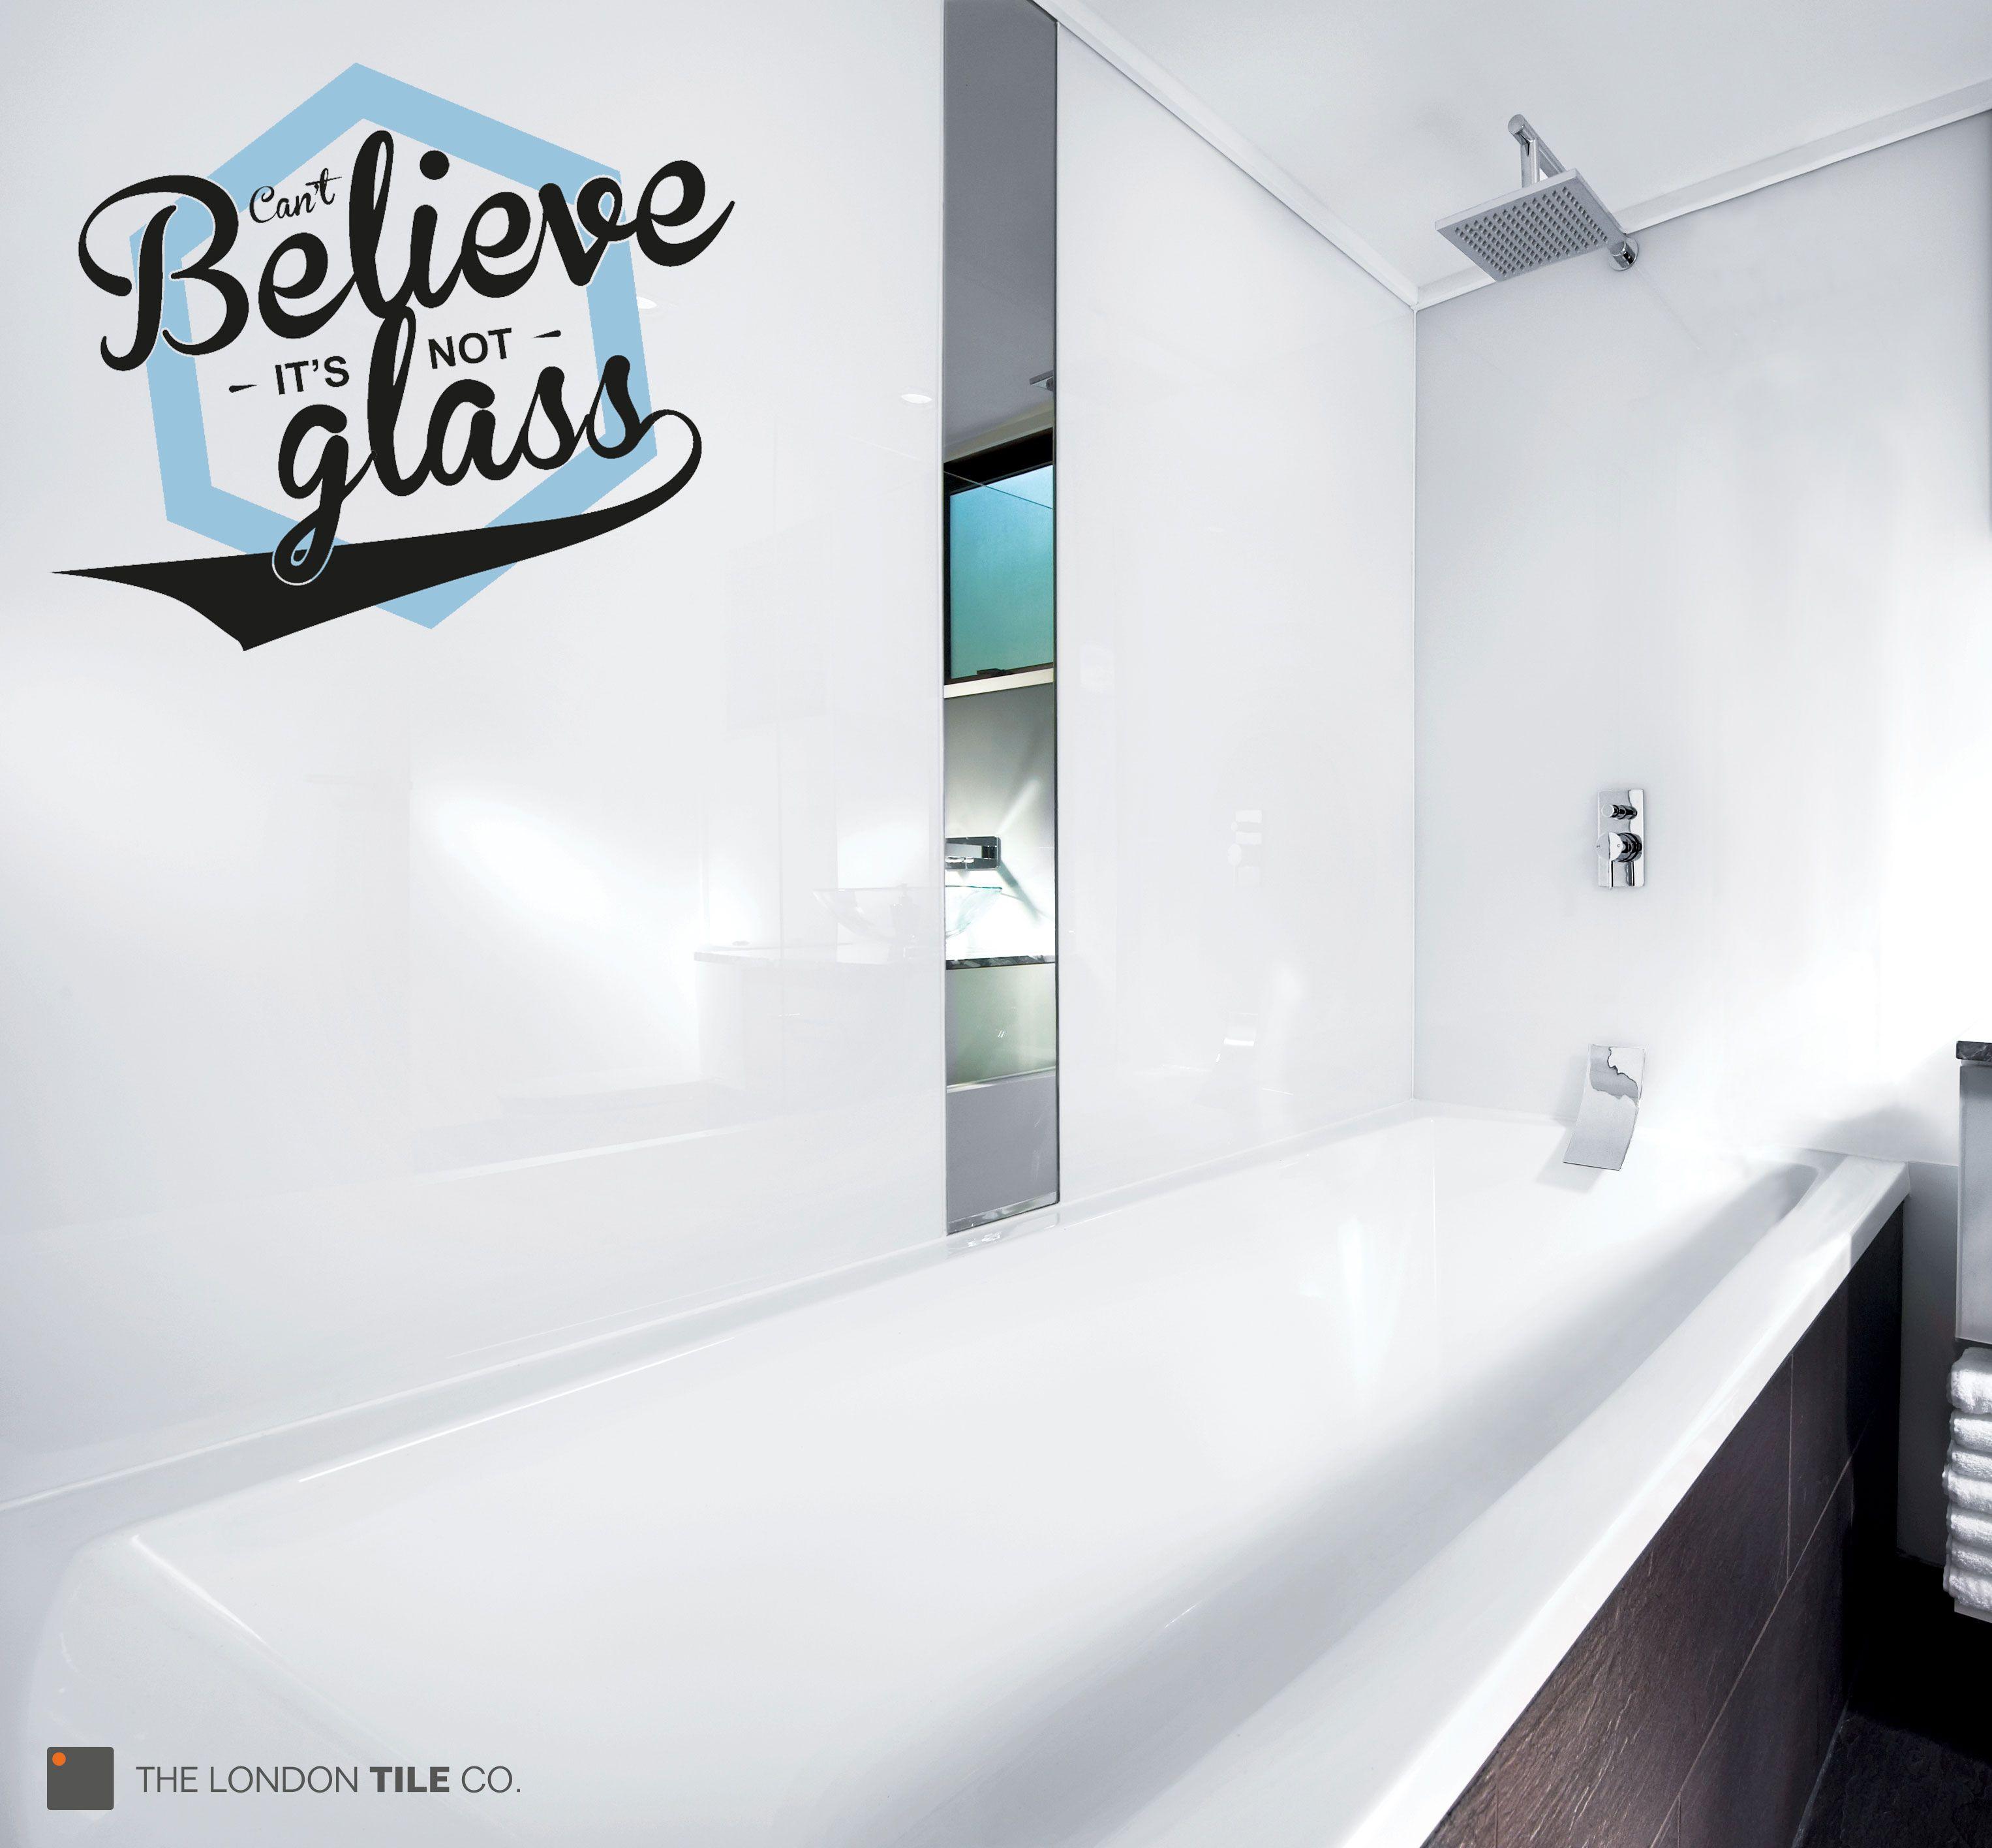 Lustrolite Arctic White Acrylic Bathroom Wall Panels You Wont - Acrylic bathroom wall panels for bathroom decor ideas